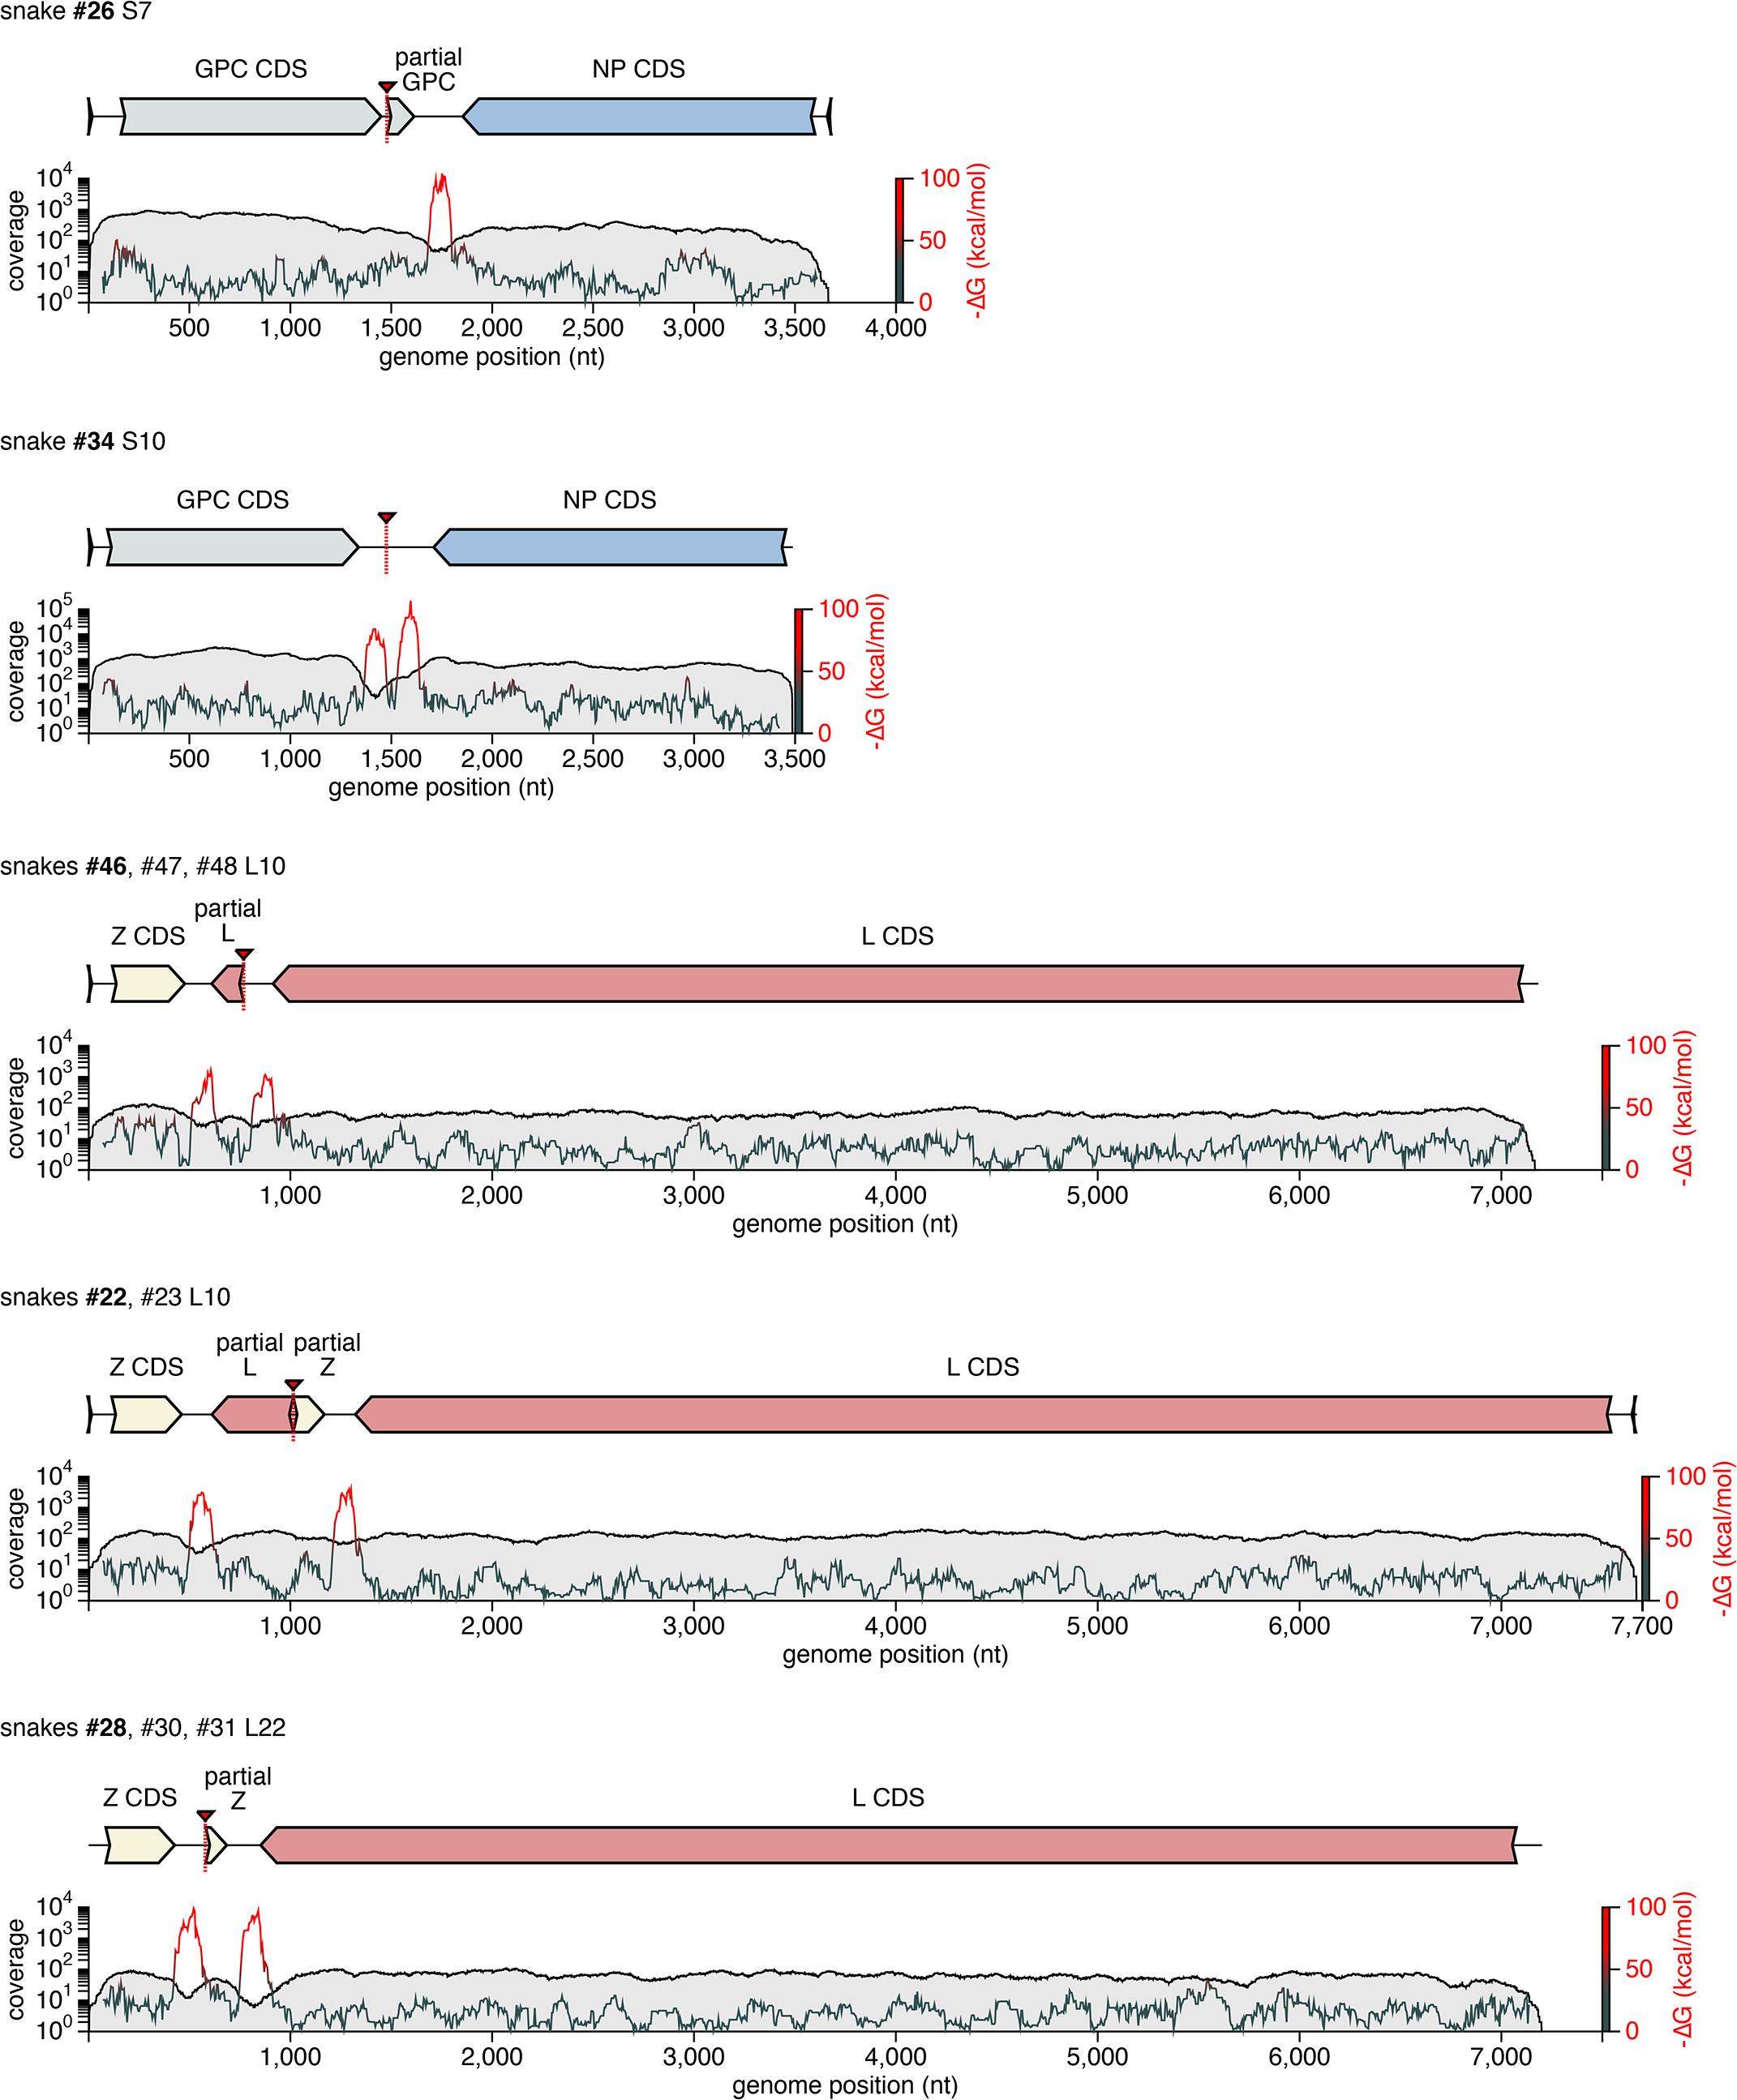 Recombinant genome segments with unusual organizations.